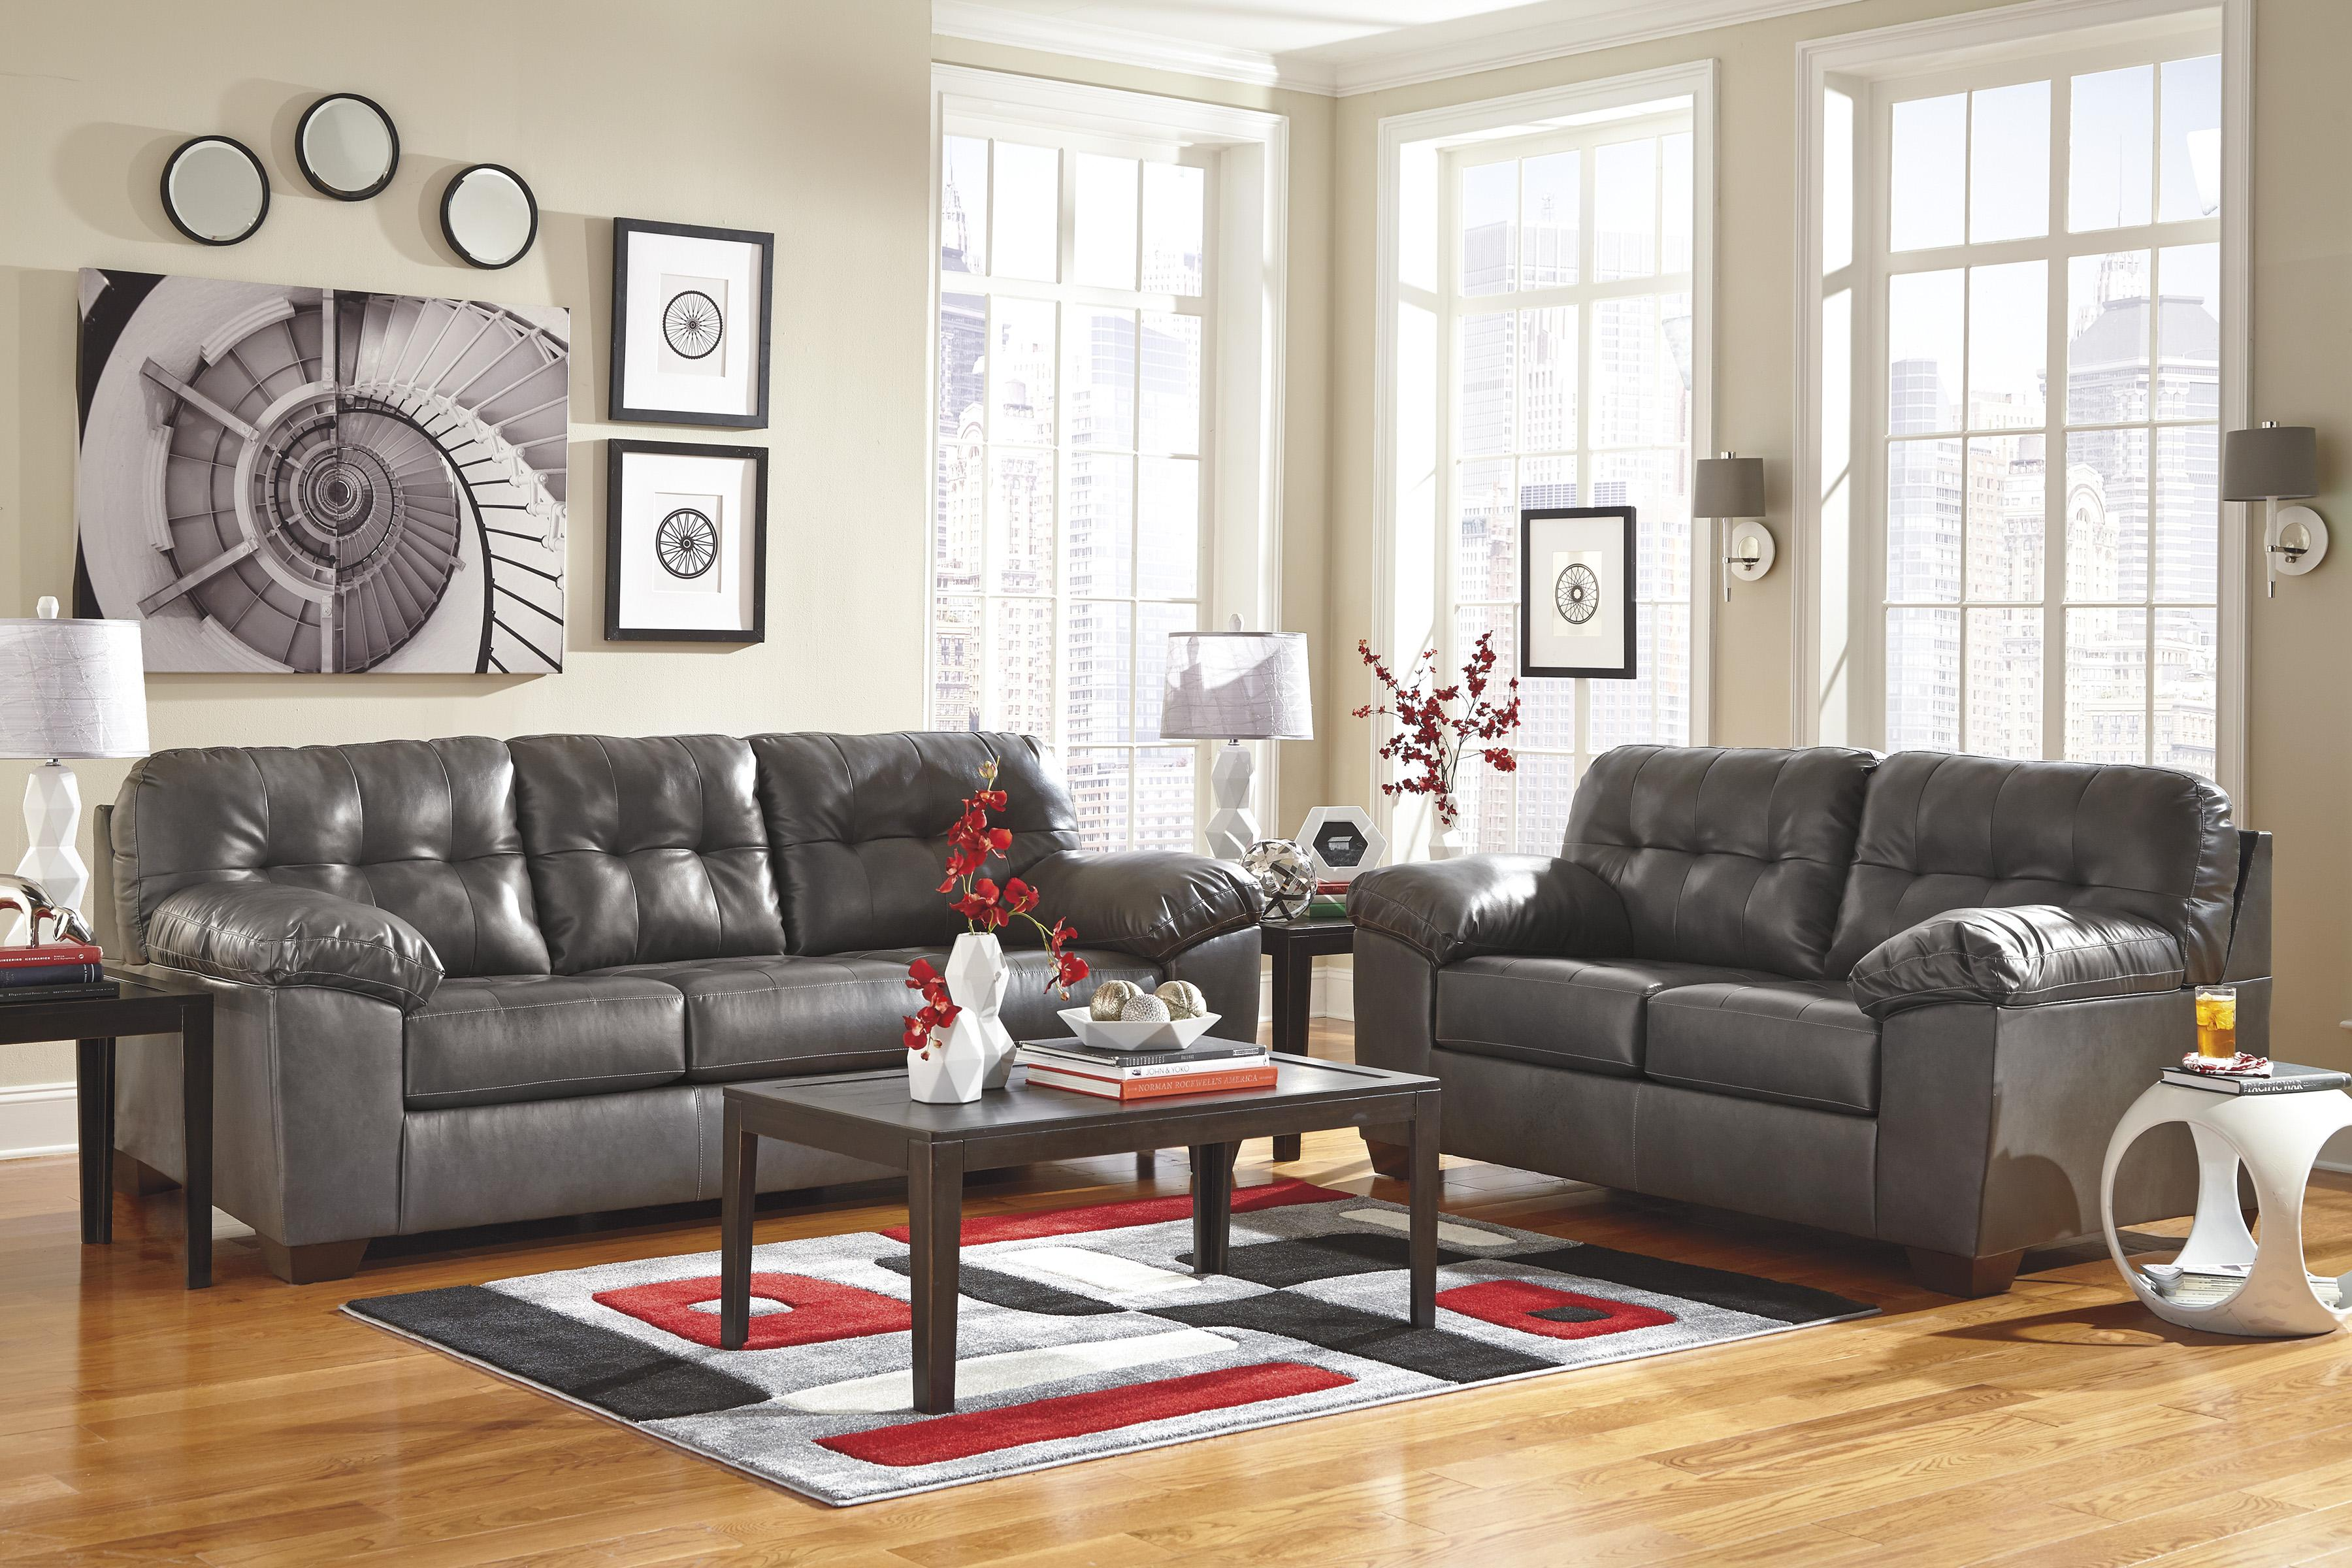 ashley furniture durablend sleeper sofa cheap stretch covers uk signature design alliston gray 2010239